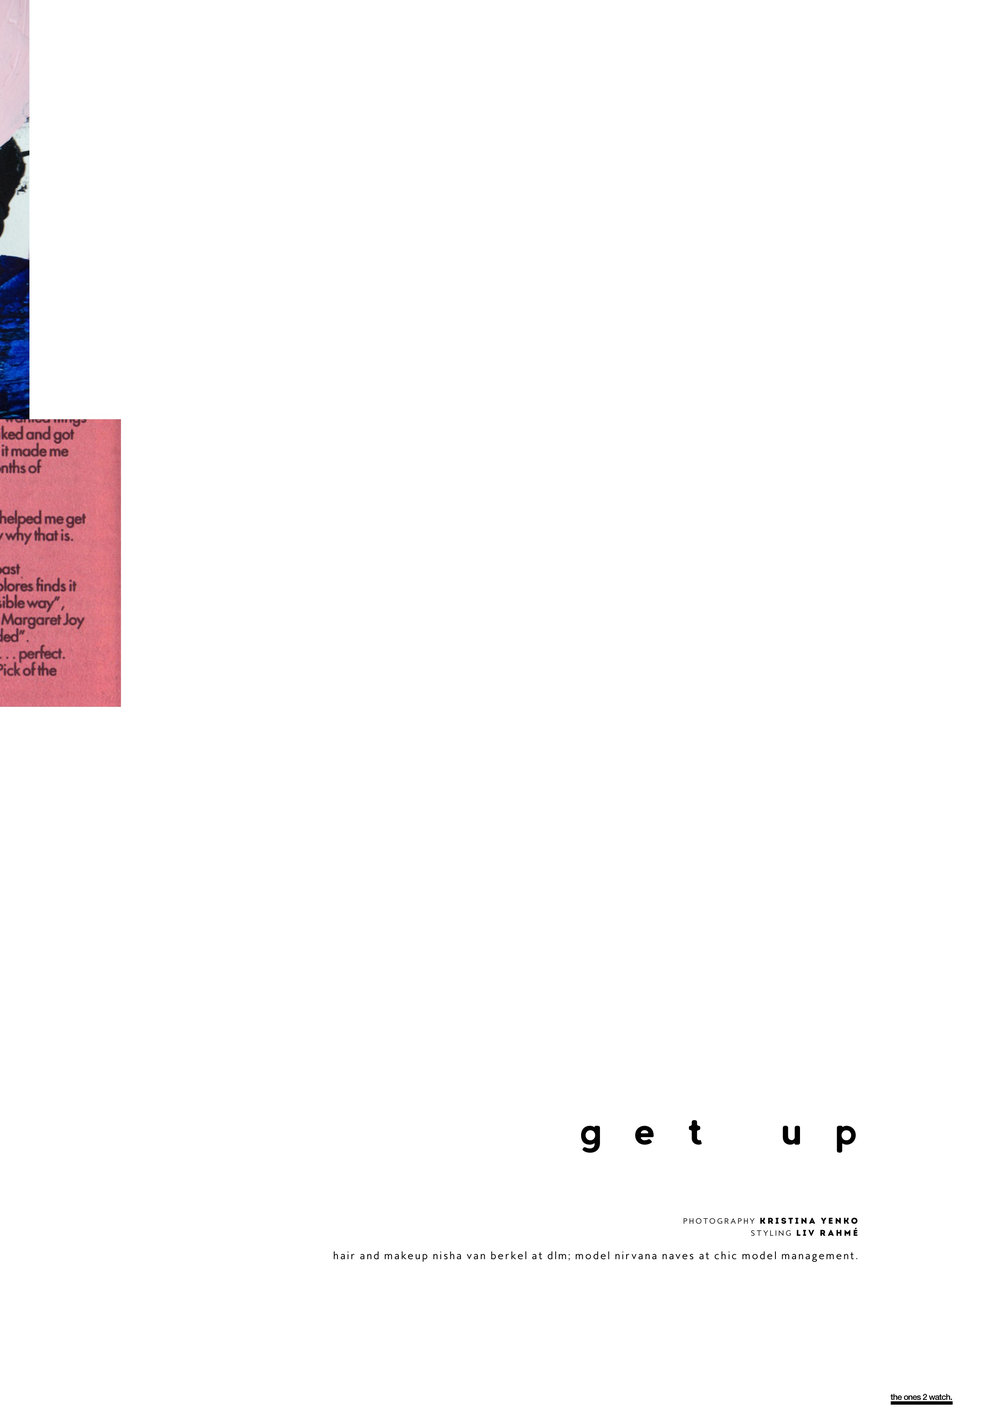 TO2WNov18 - GetUp 1R.jpg